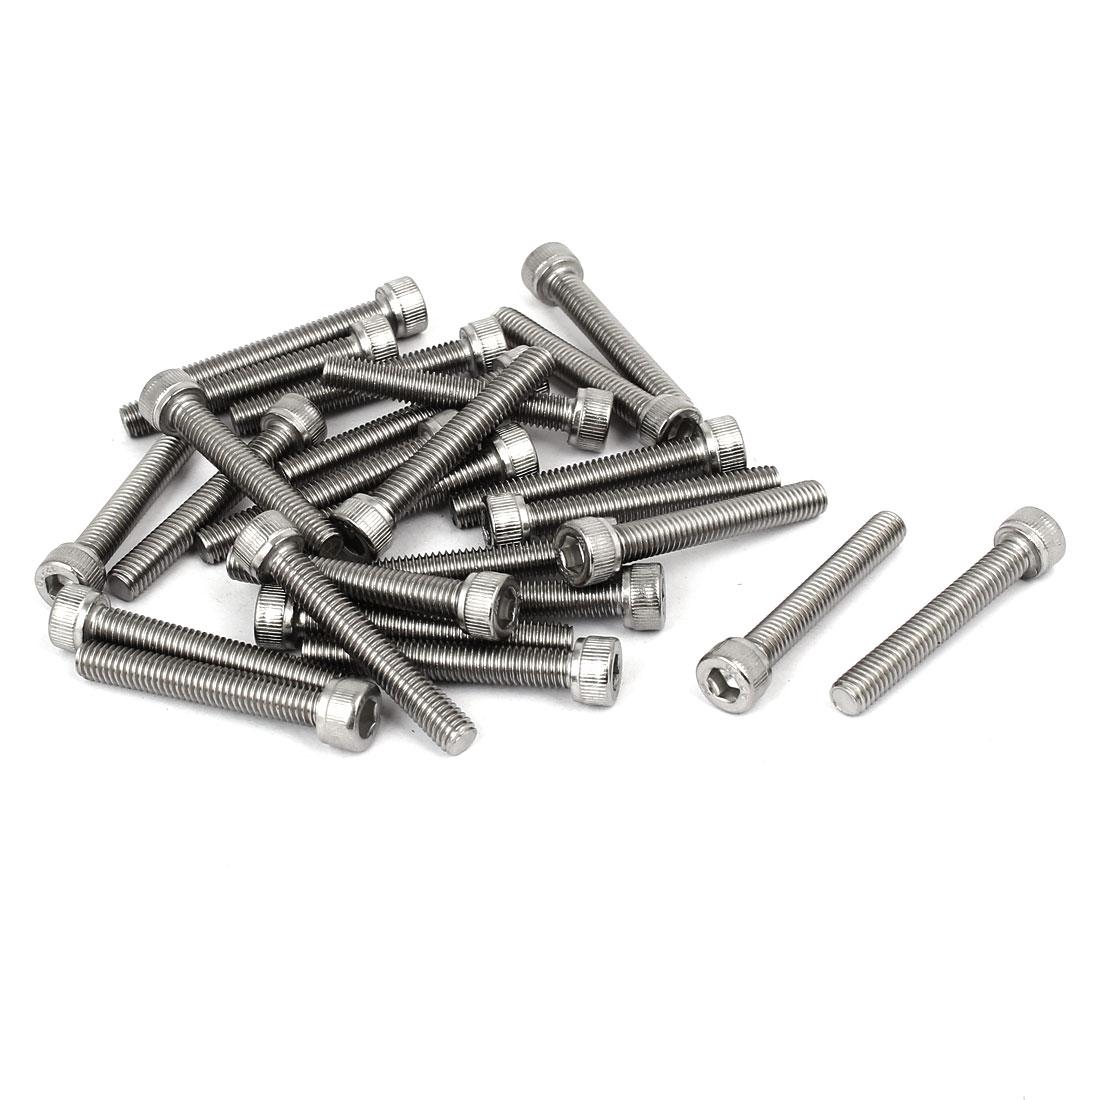 M6 x 40mm Thread 304 Stainless Steel Hex Socket Head Cap Screw Bolt DIN912 26pcs